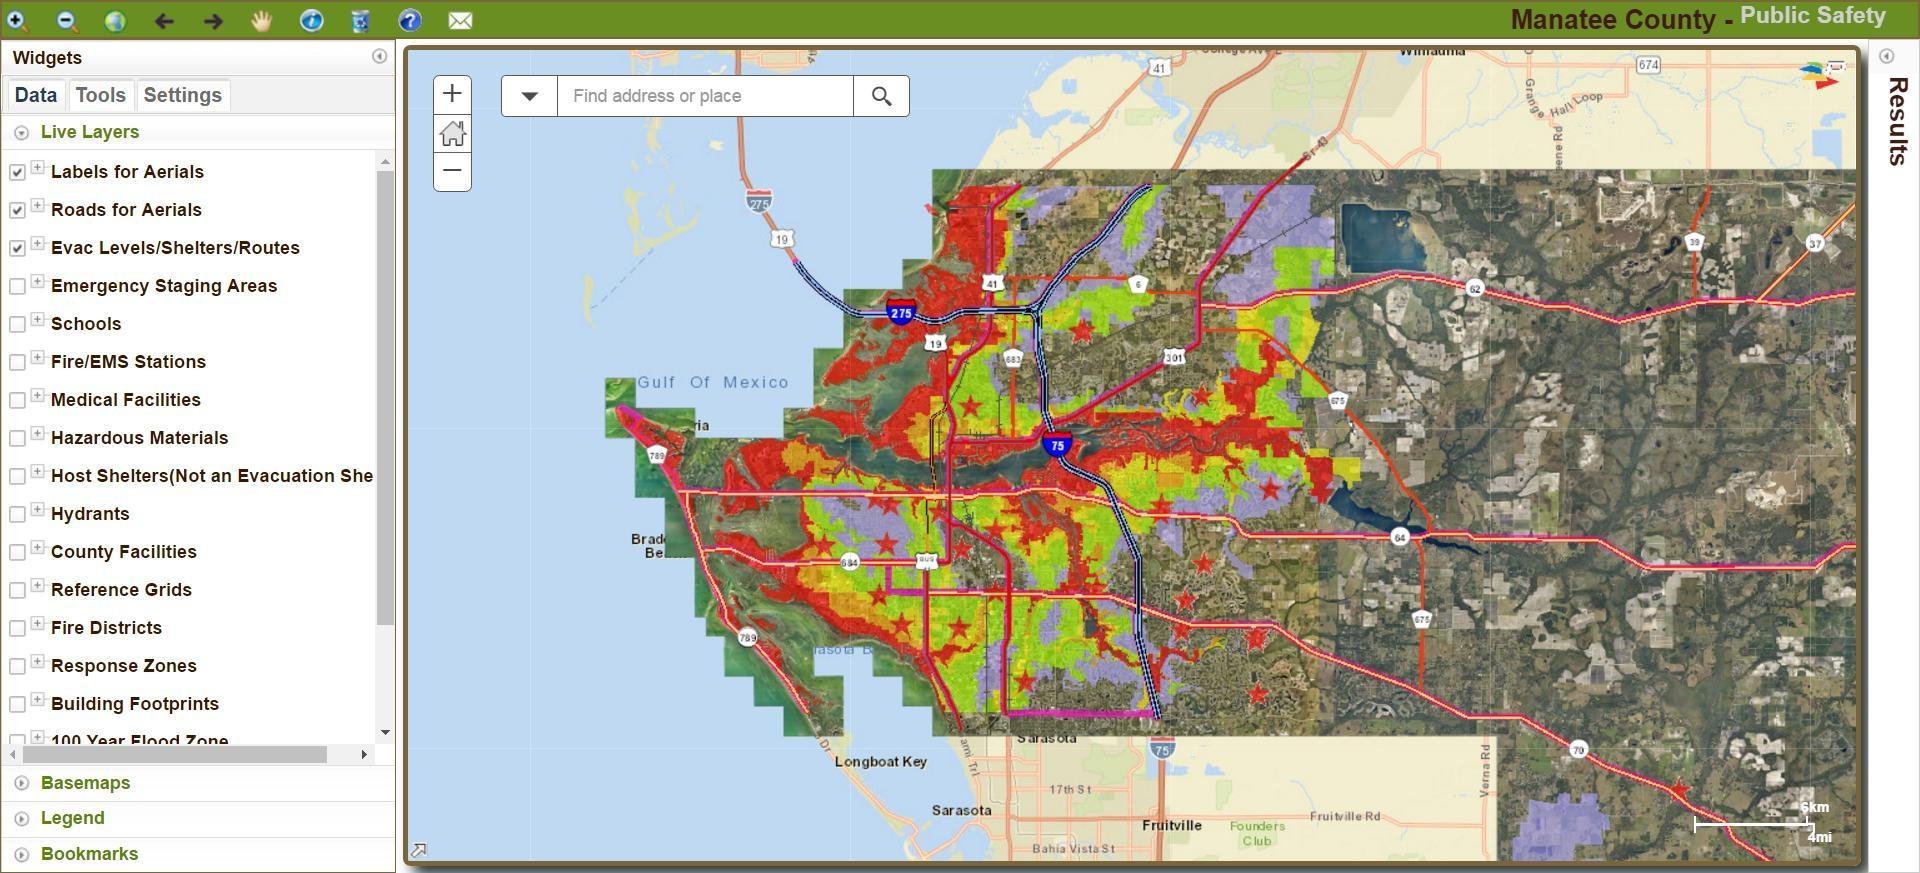 Manatee County Updates Hurricane Storm Surge Maps - News - Sarasota - Venice Florida Flood Map